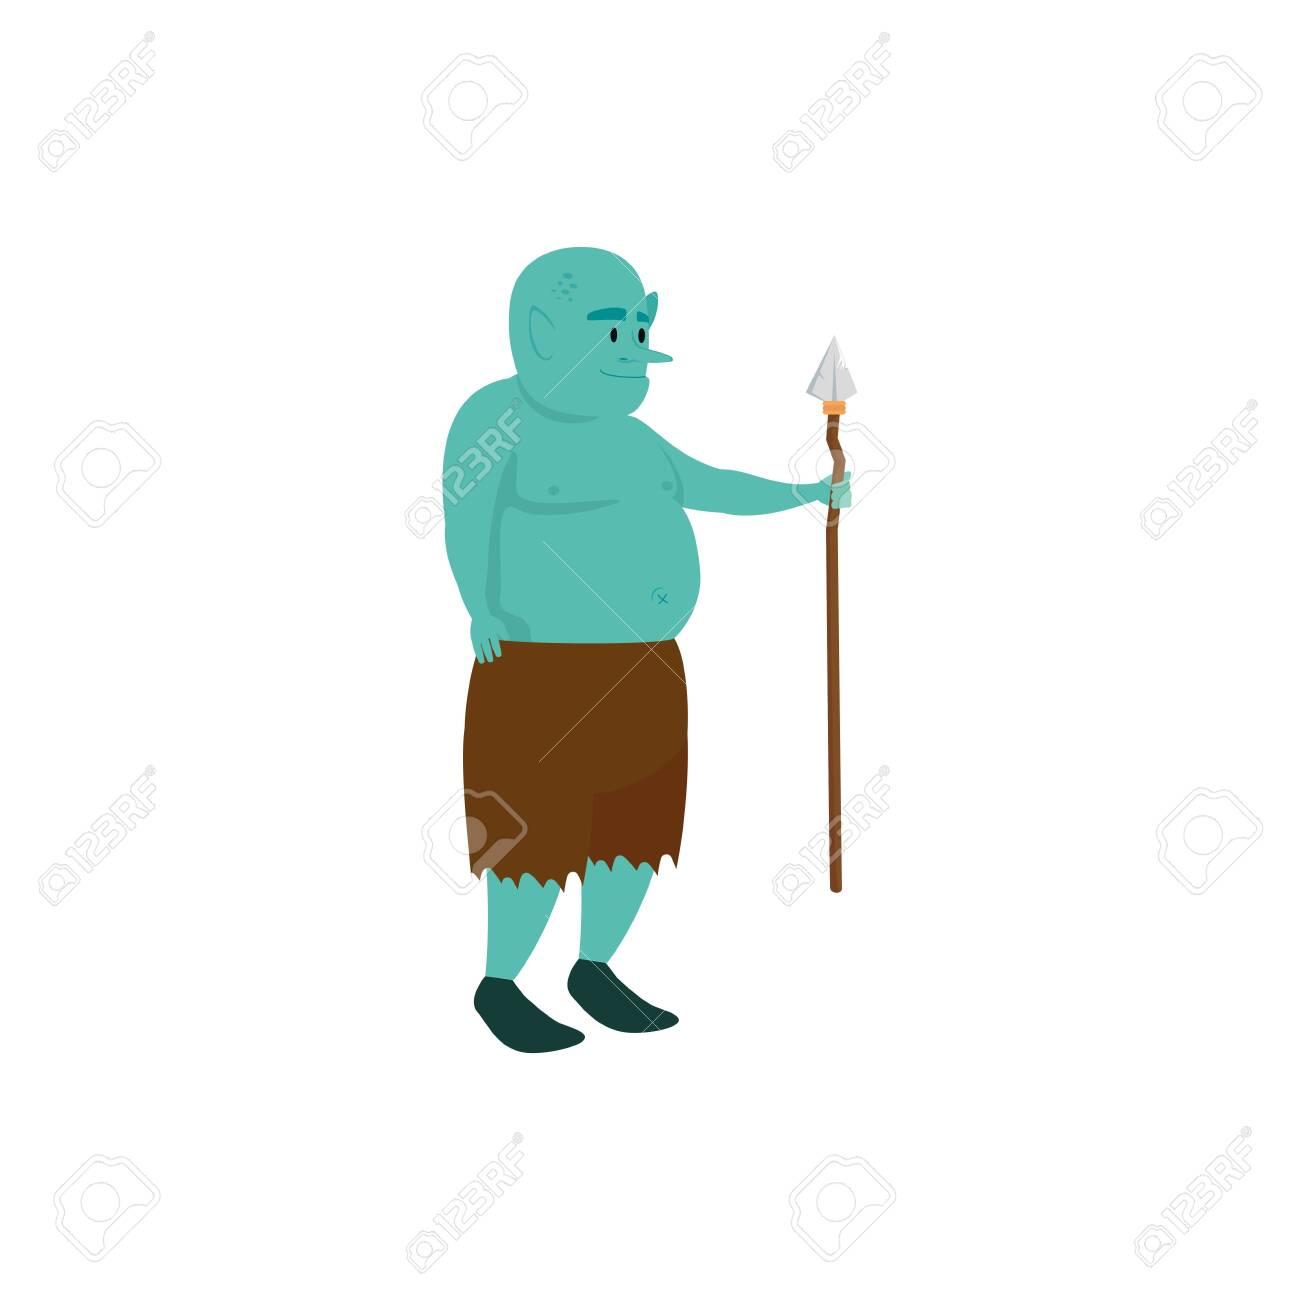 ogre fantasy magic with spear vector illustration design - 133150753